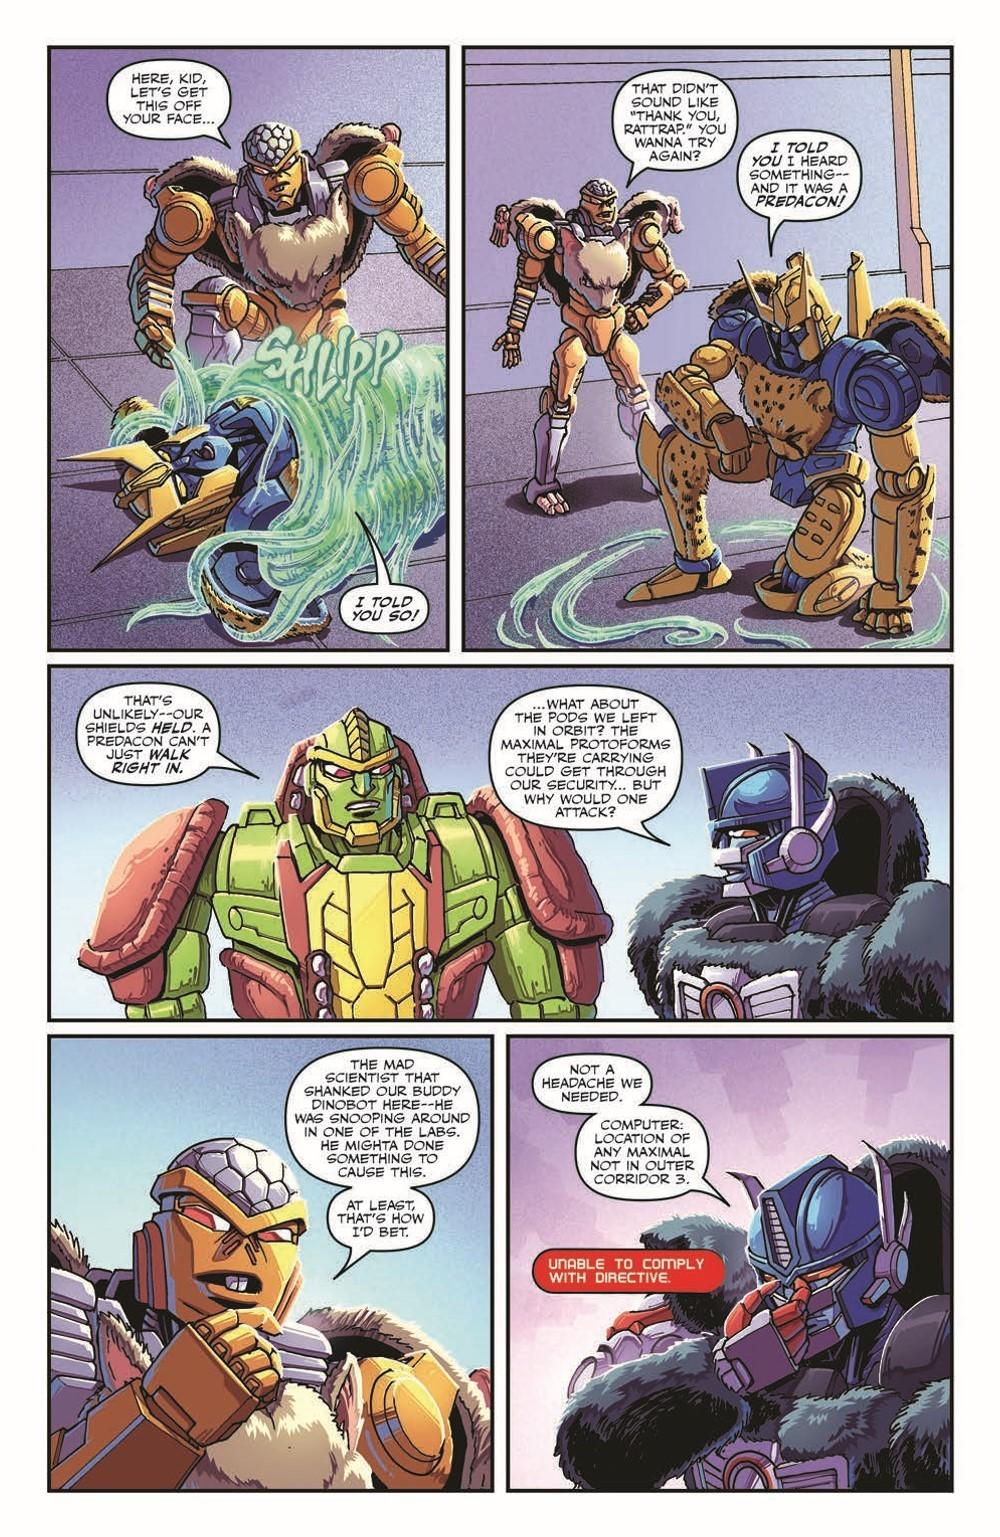 TFBW_08_pr-5 ComicList Previews: TRANSFORMERS BEAST WARS #8